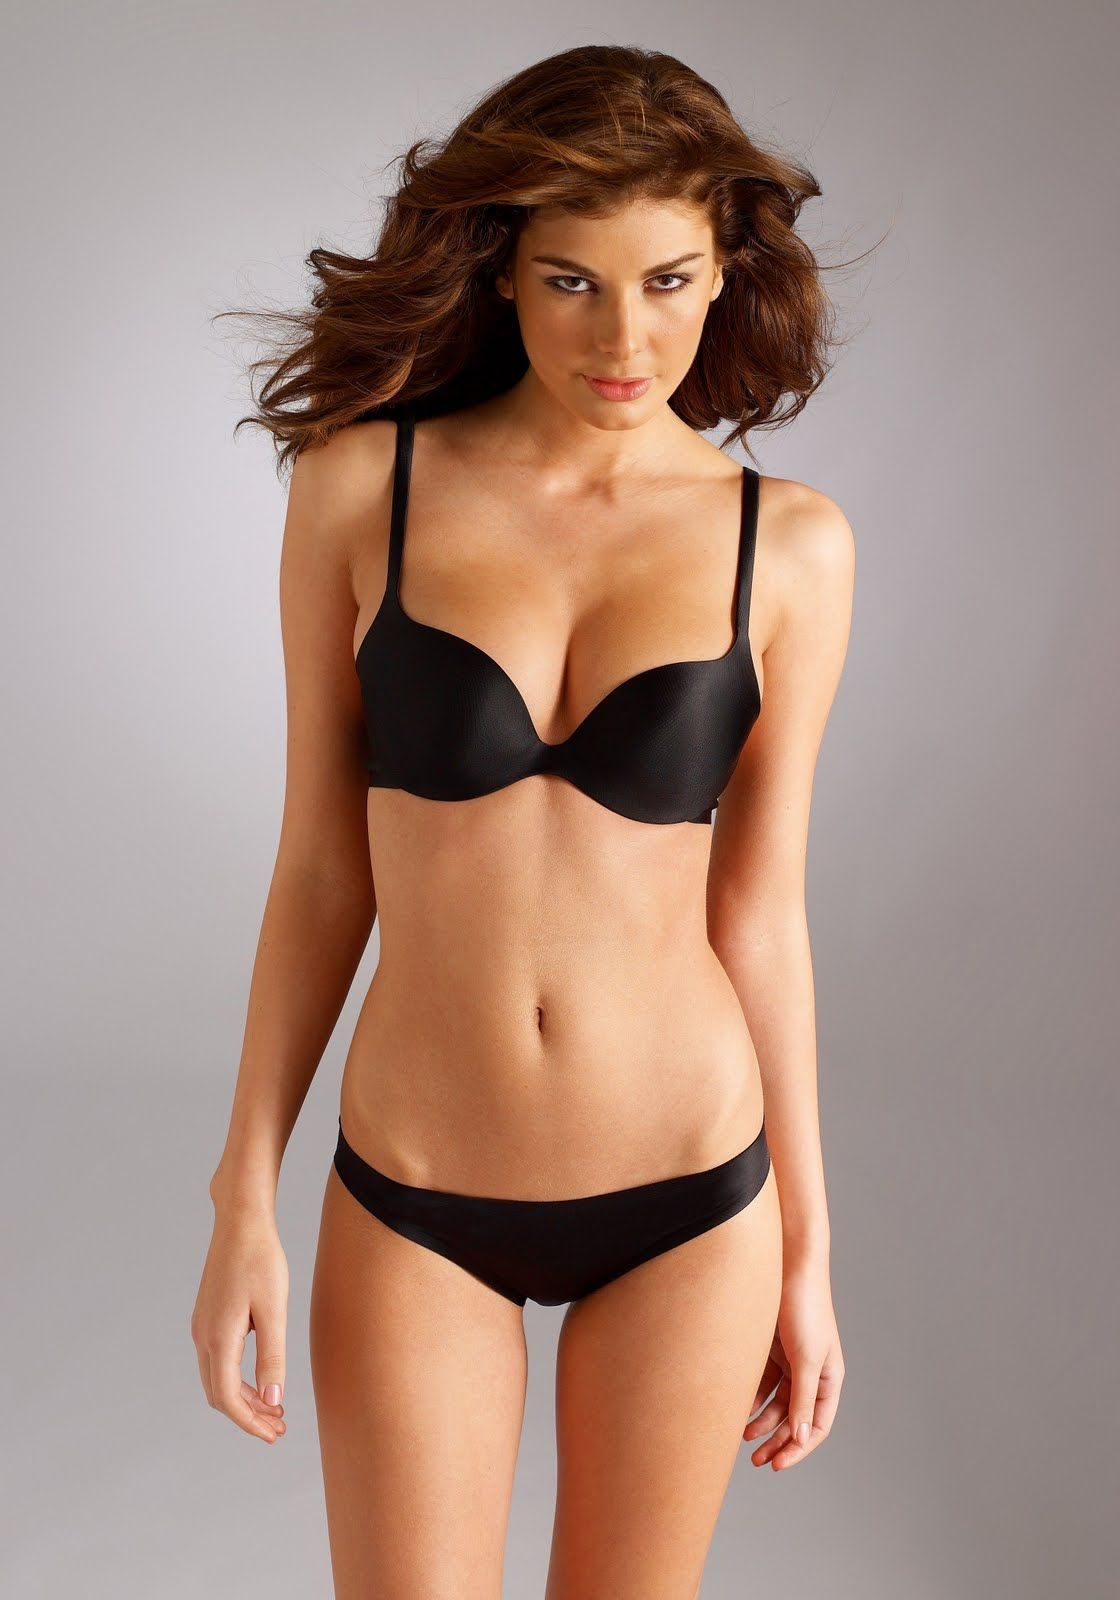 Albanian Model Angela Martini Models Rating Rising